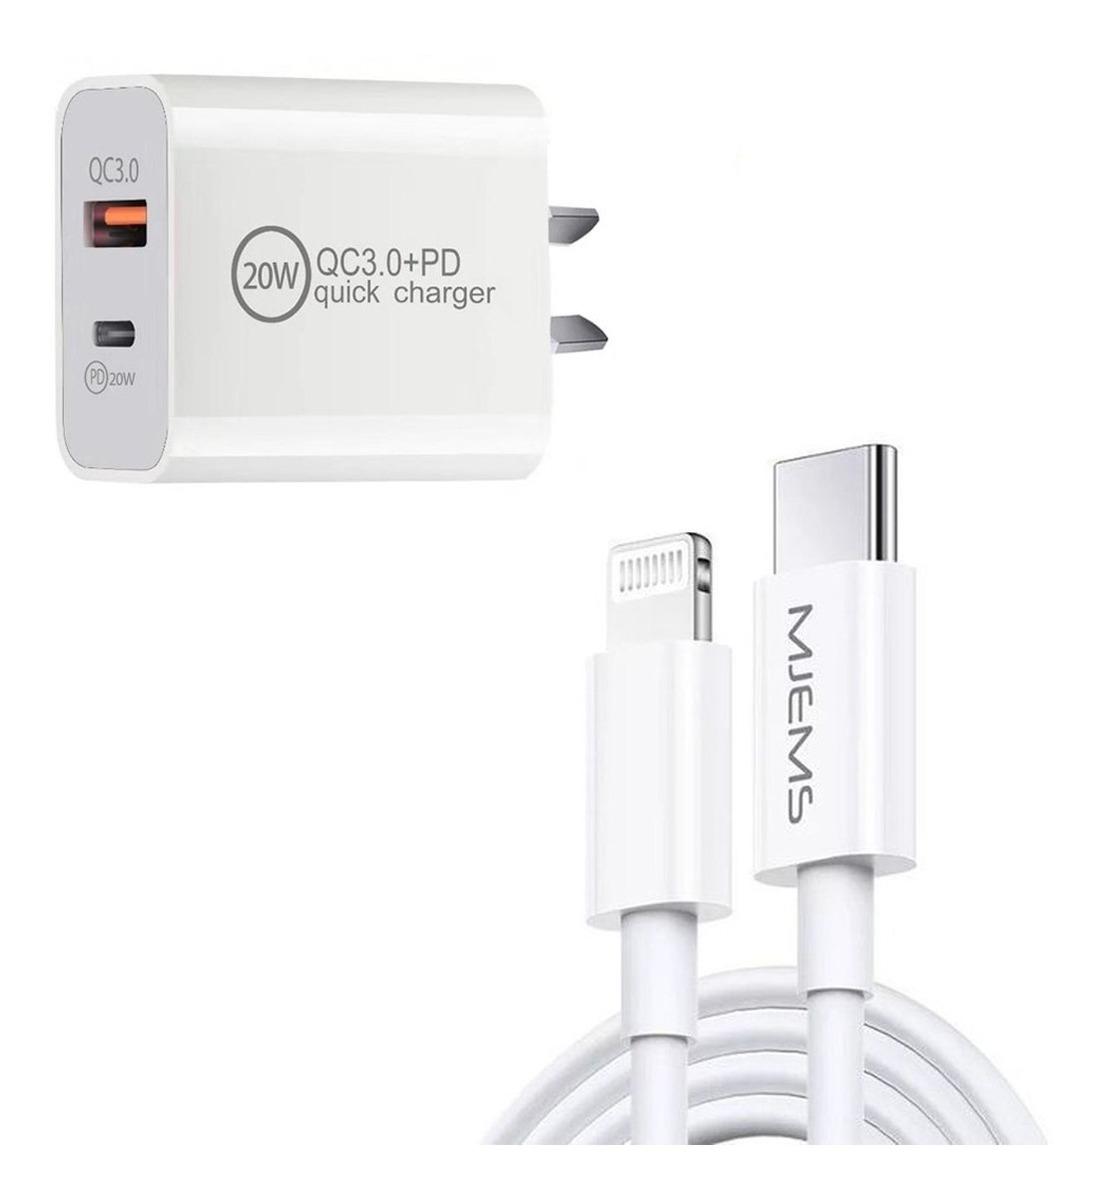 COMBO ENCHUFE CARGA RAPIDA BLANCO 20W USB Y PD + CABLE MJEMS BLANCO